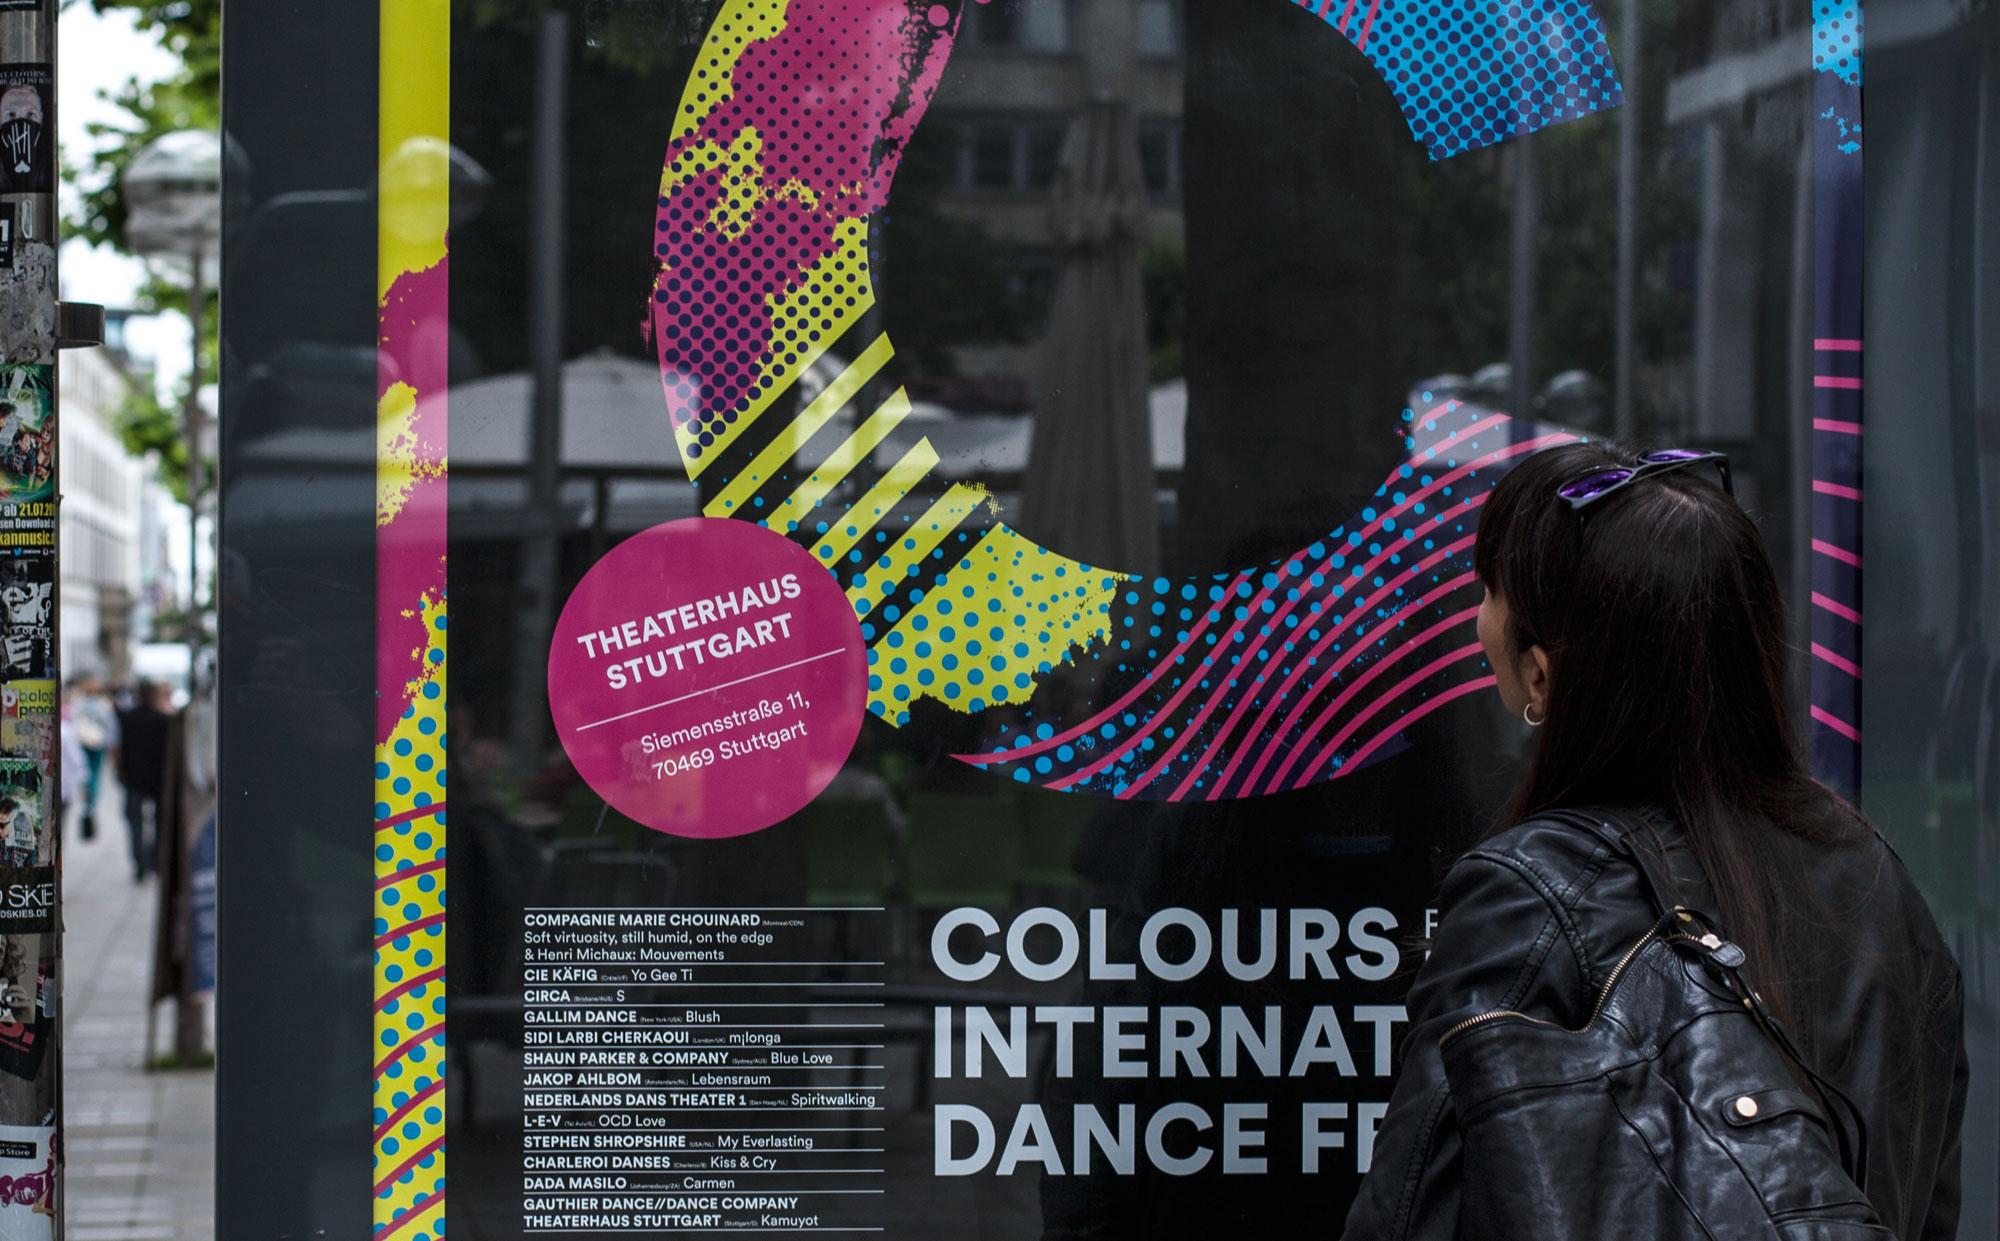 75a aus Stuttgart entwickelt das Corporate Design des Colours International Dance Festival 2015 presented by Eric Gauthier